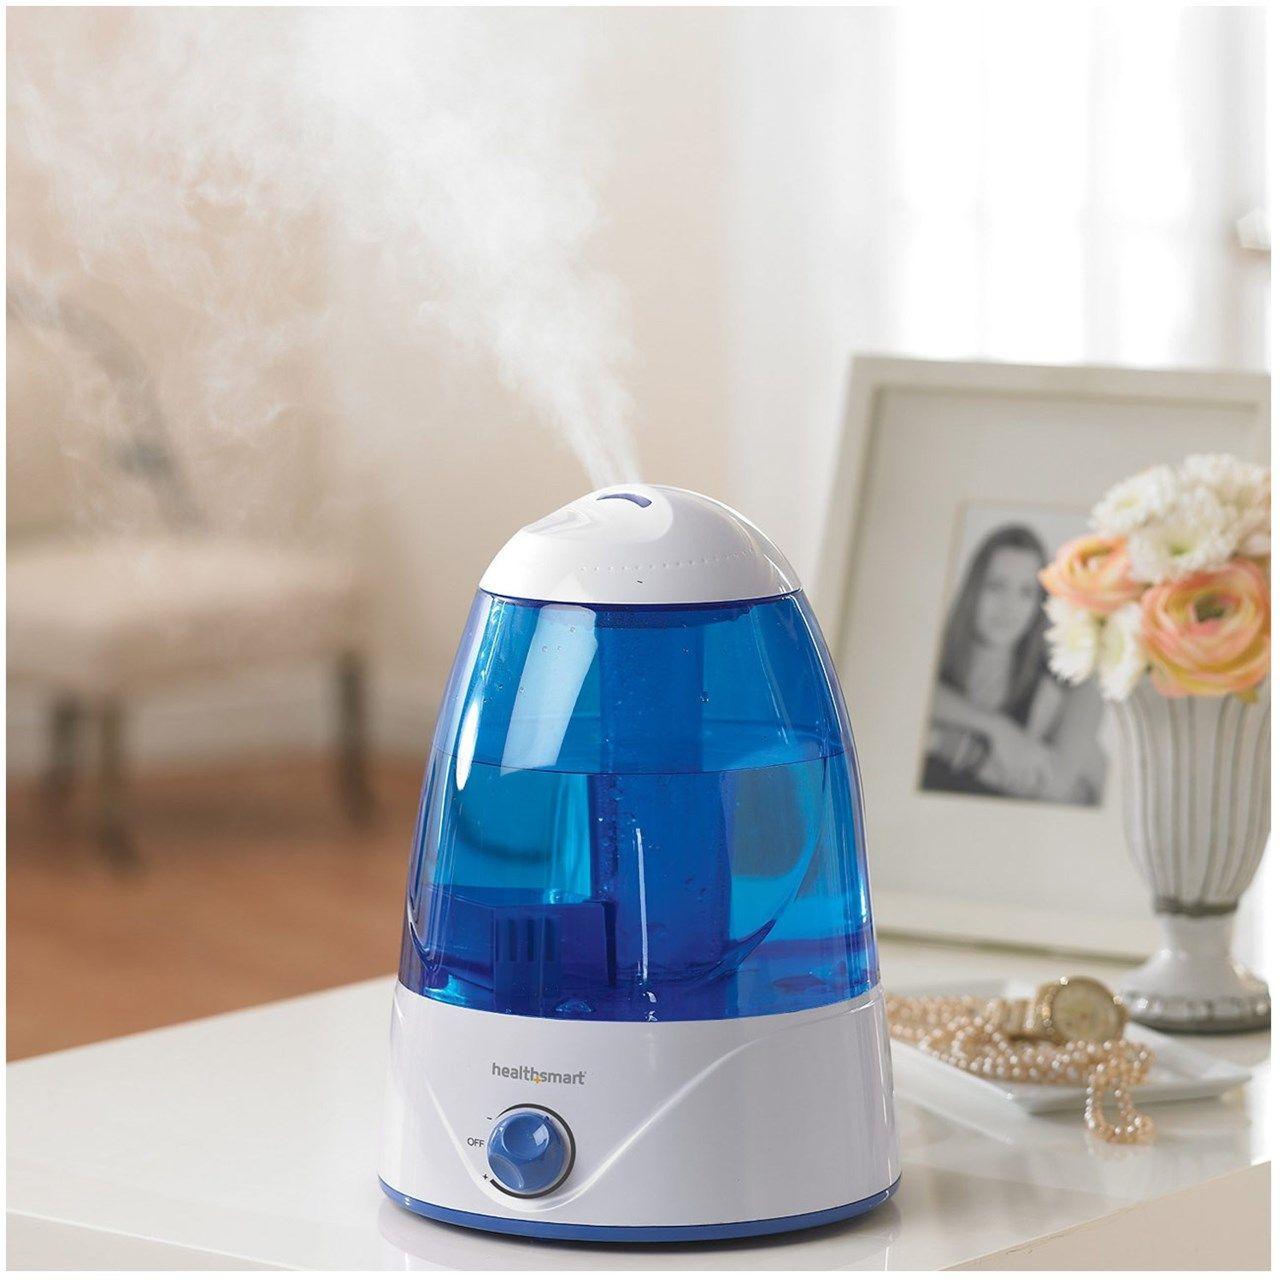 HealthSmart Cosmo Mist Ultrasonic Cool Mist Humidifier